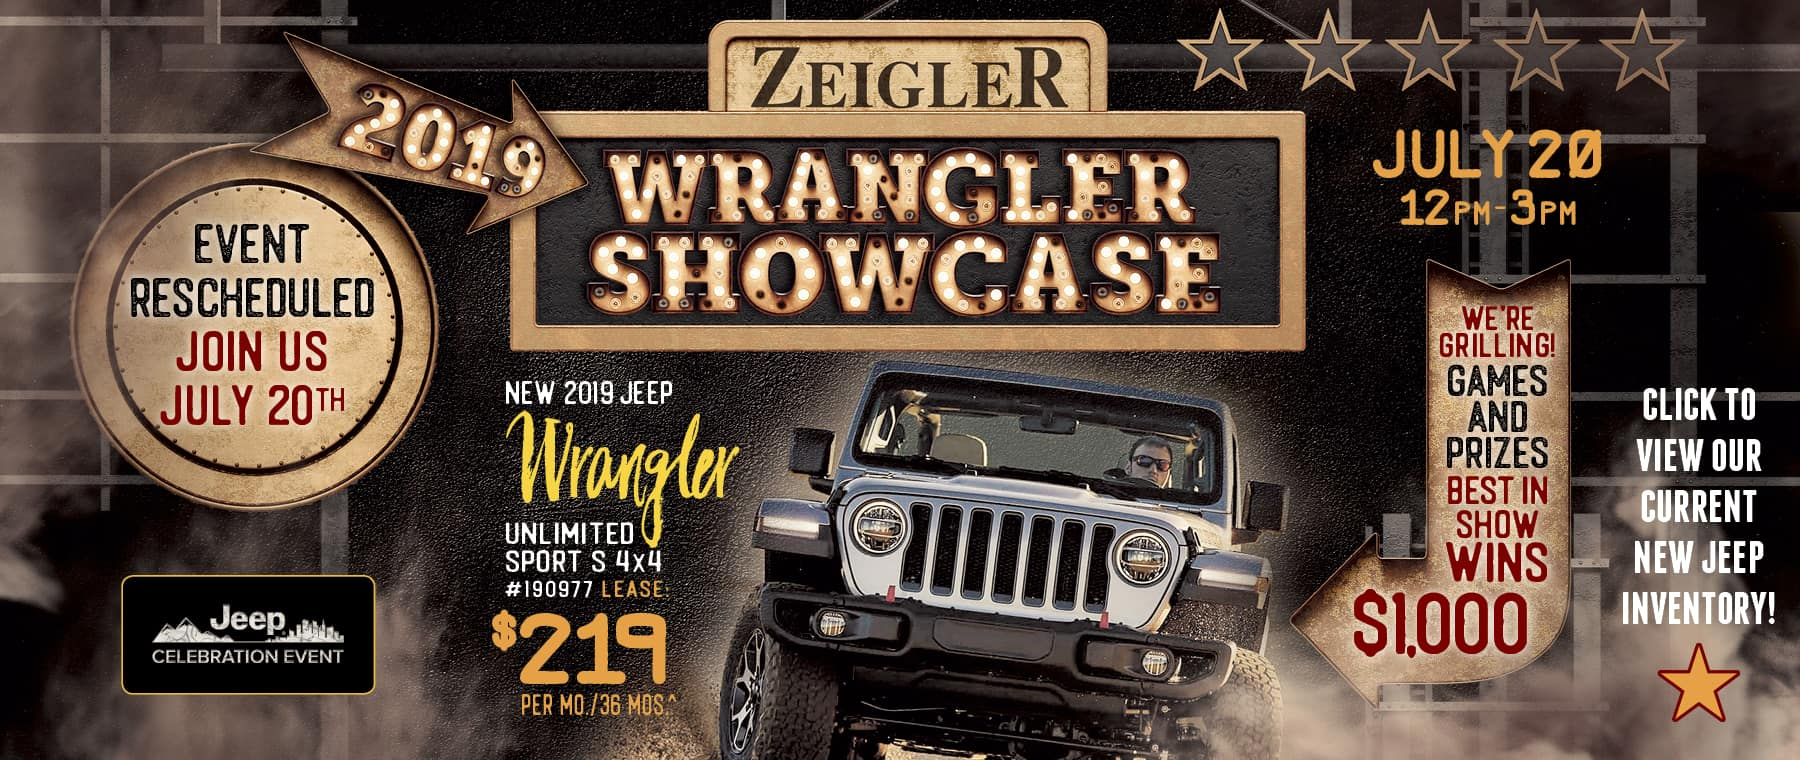 wrangler showcase